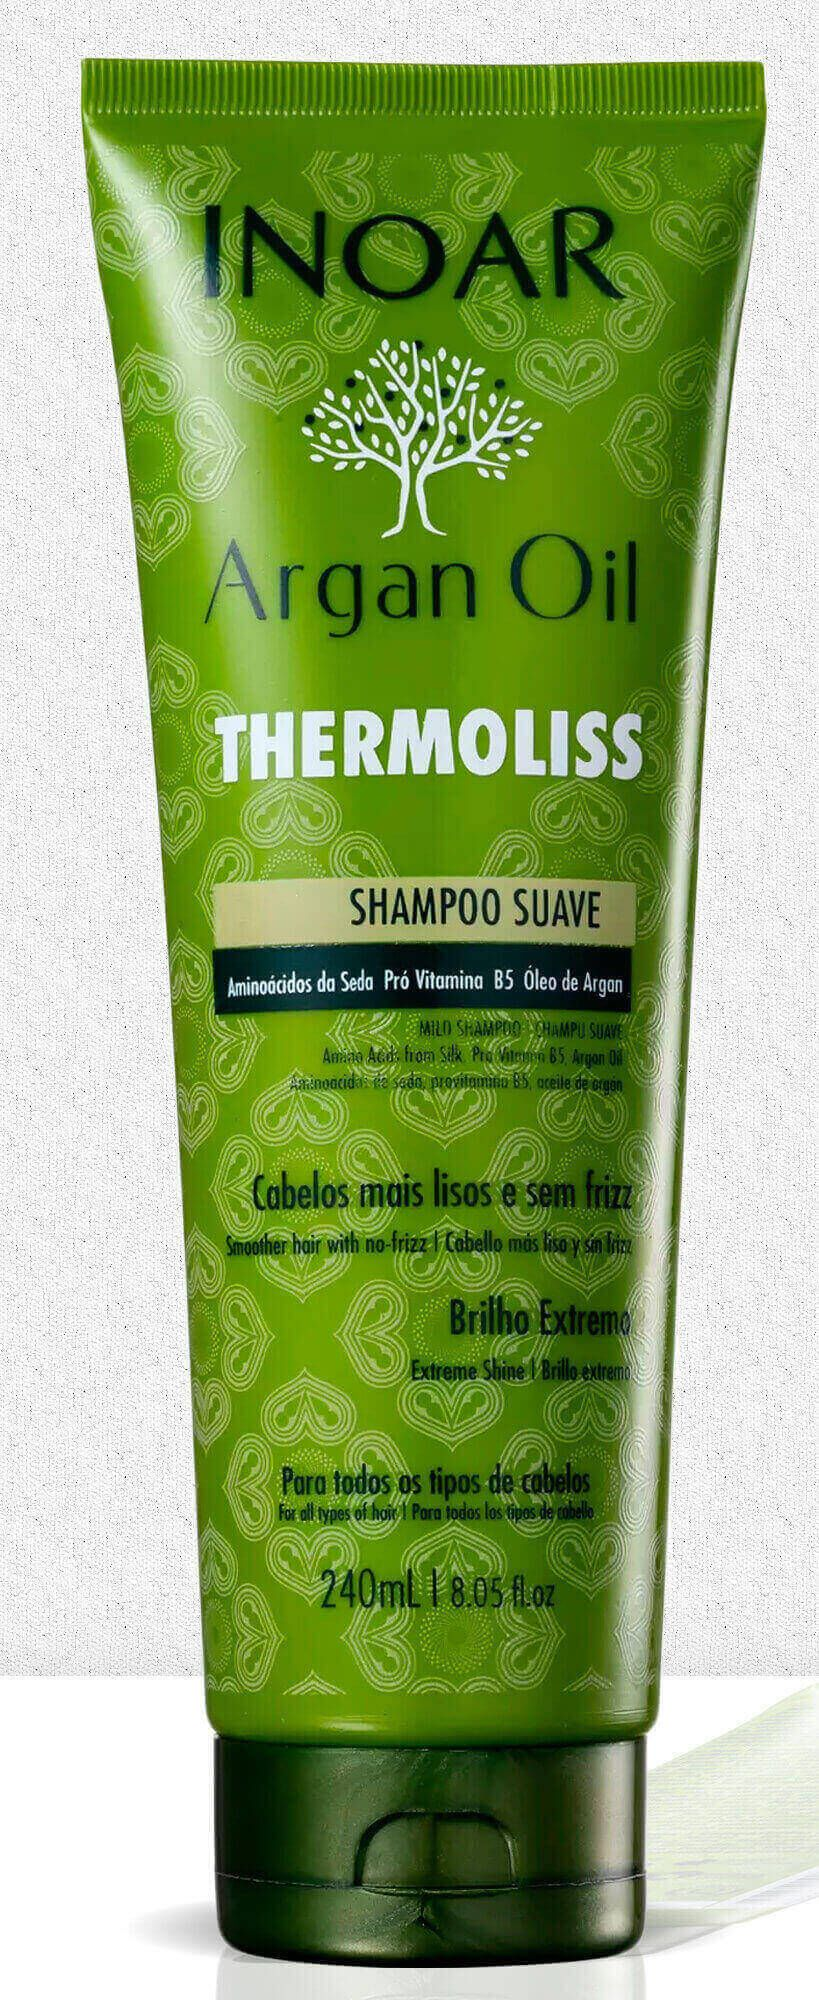 Shampoo Inoar Argan Oil System Thermoliss 240ml